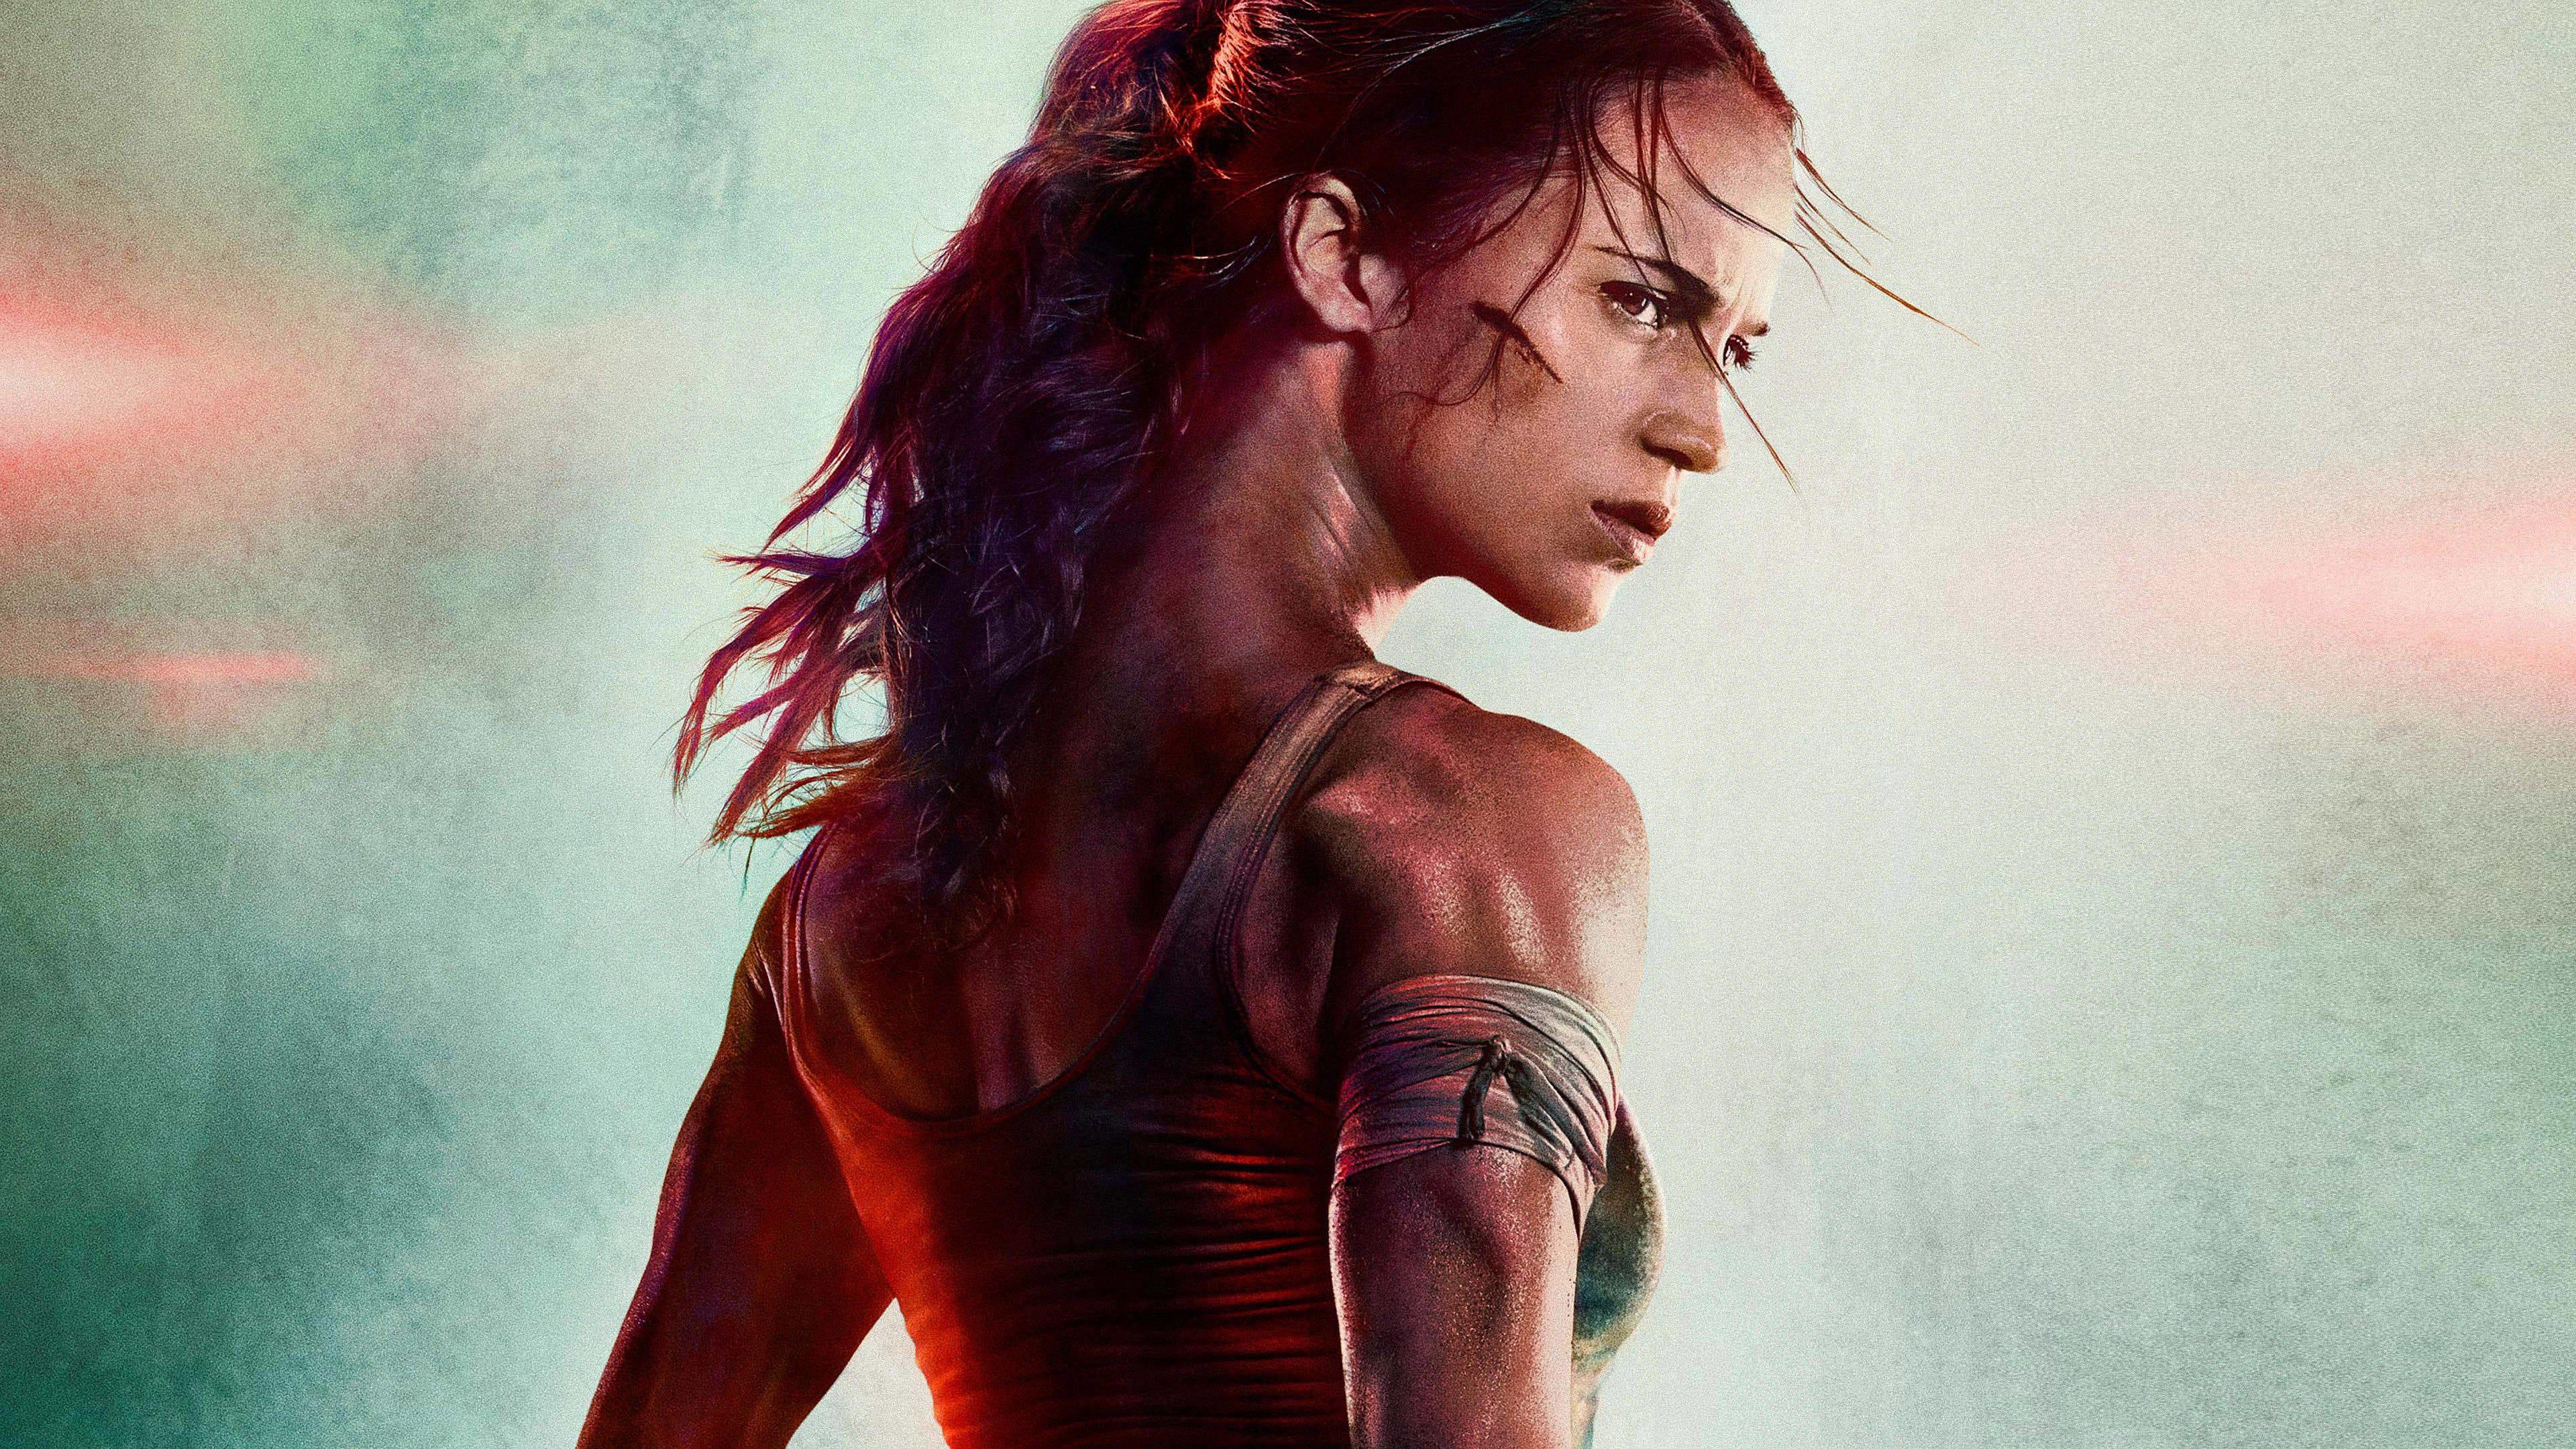 2018 Full Movie Hd Free Tomb Raider Lara Croft Alicia Vikander